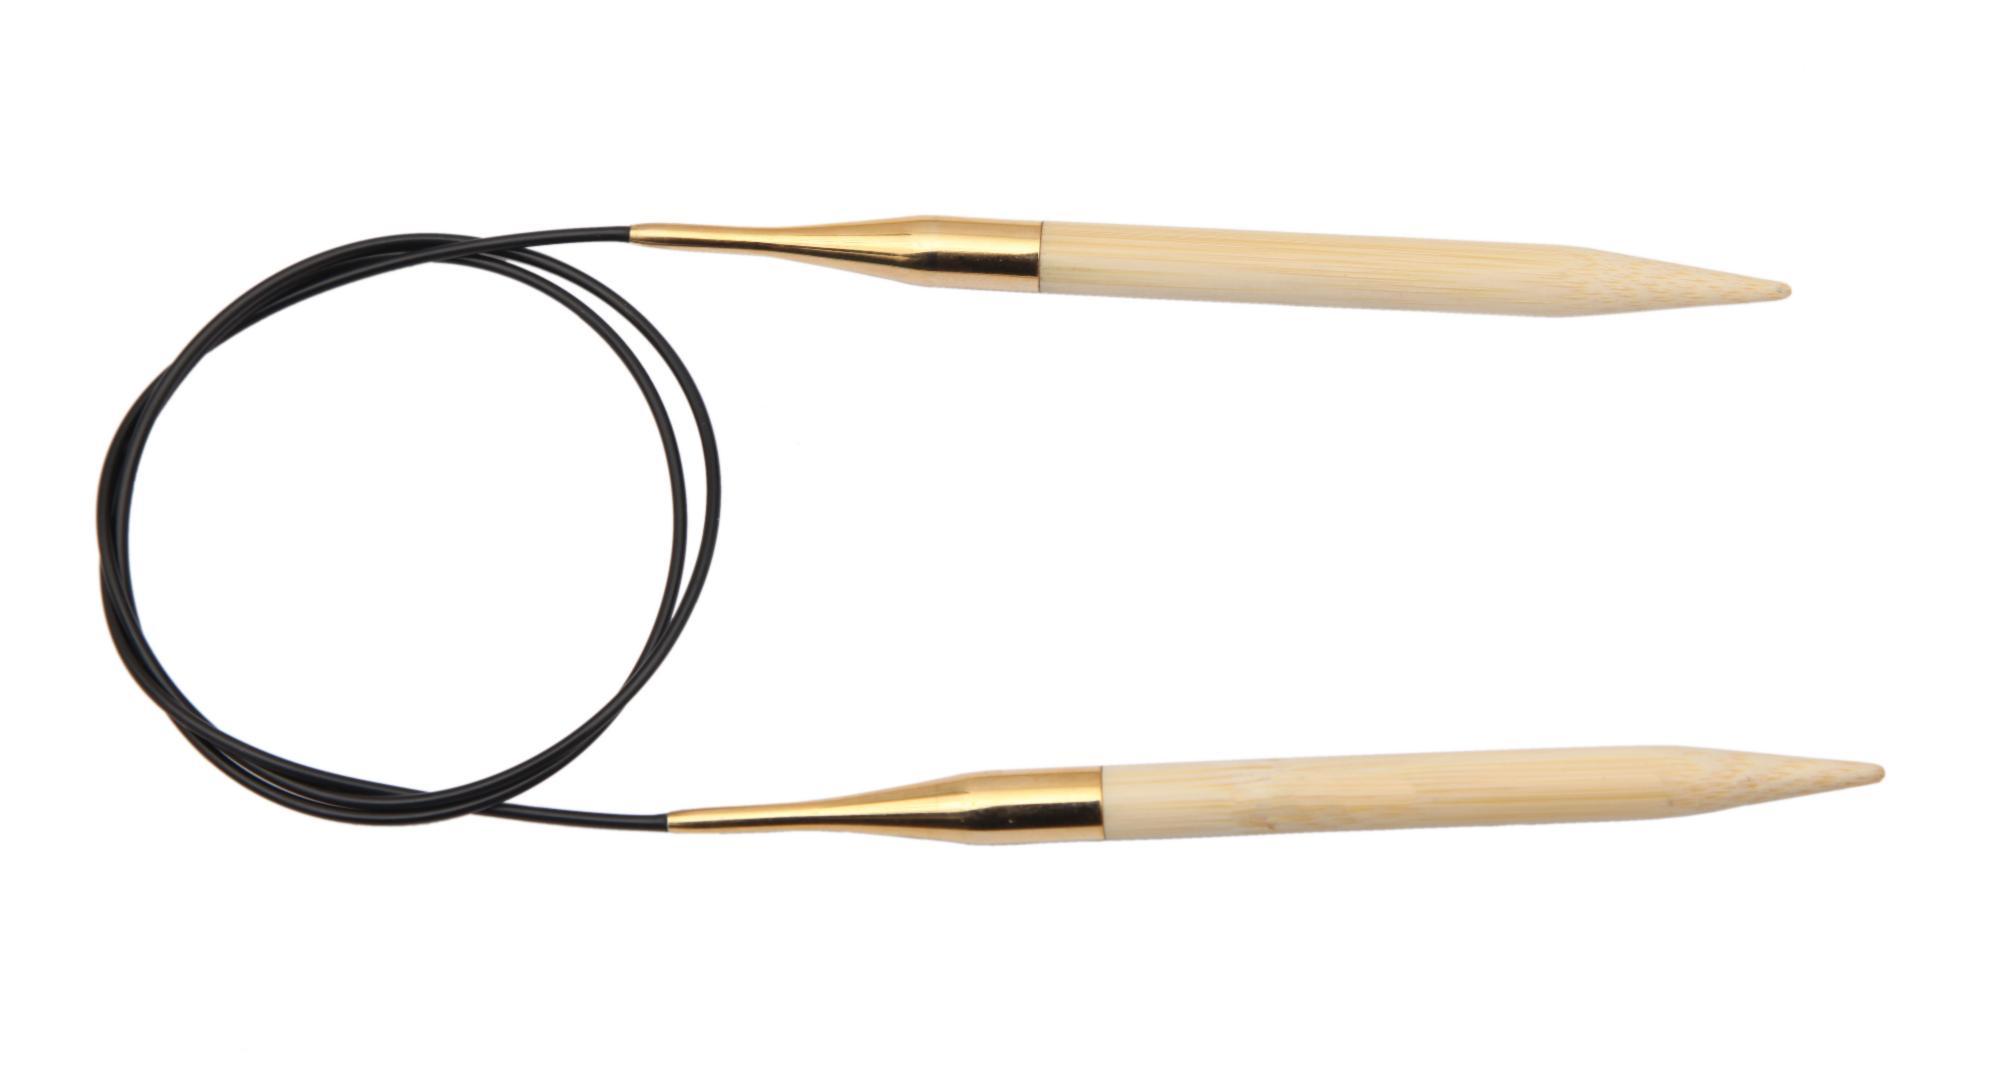 Спицы круговые 60 см Bamboo KnitPro, 22234, 8.00 мм